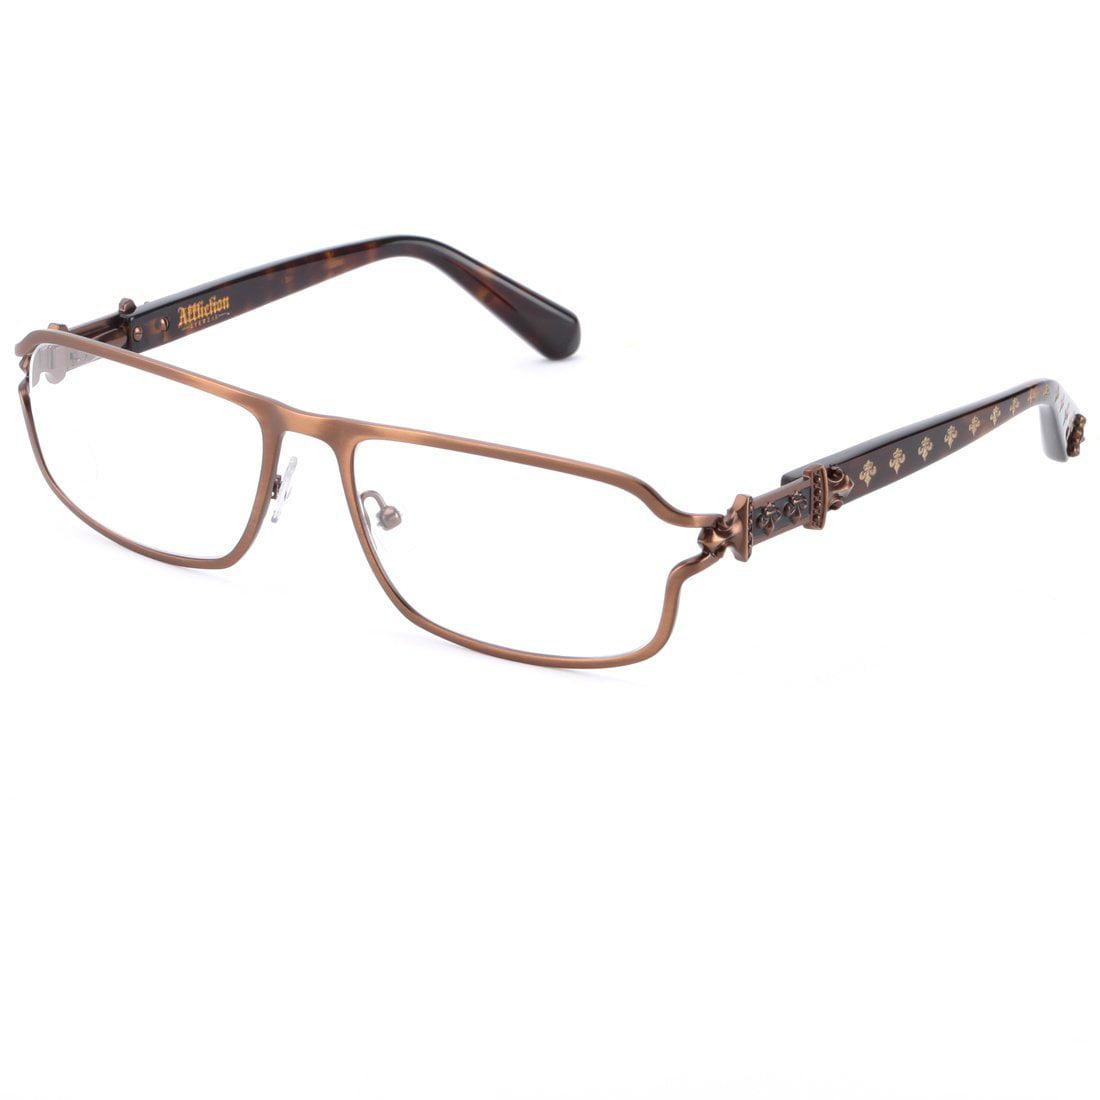 Image of Affliction MAXIMUS Designer Eyeglasses Tortoise/Ant Gold